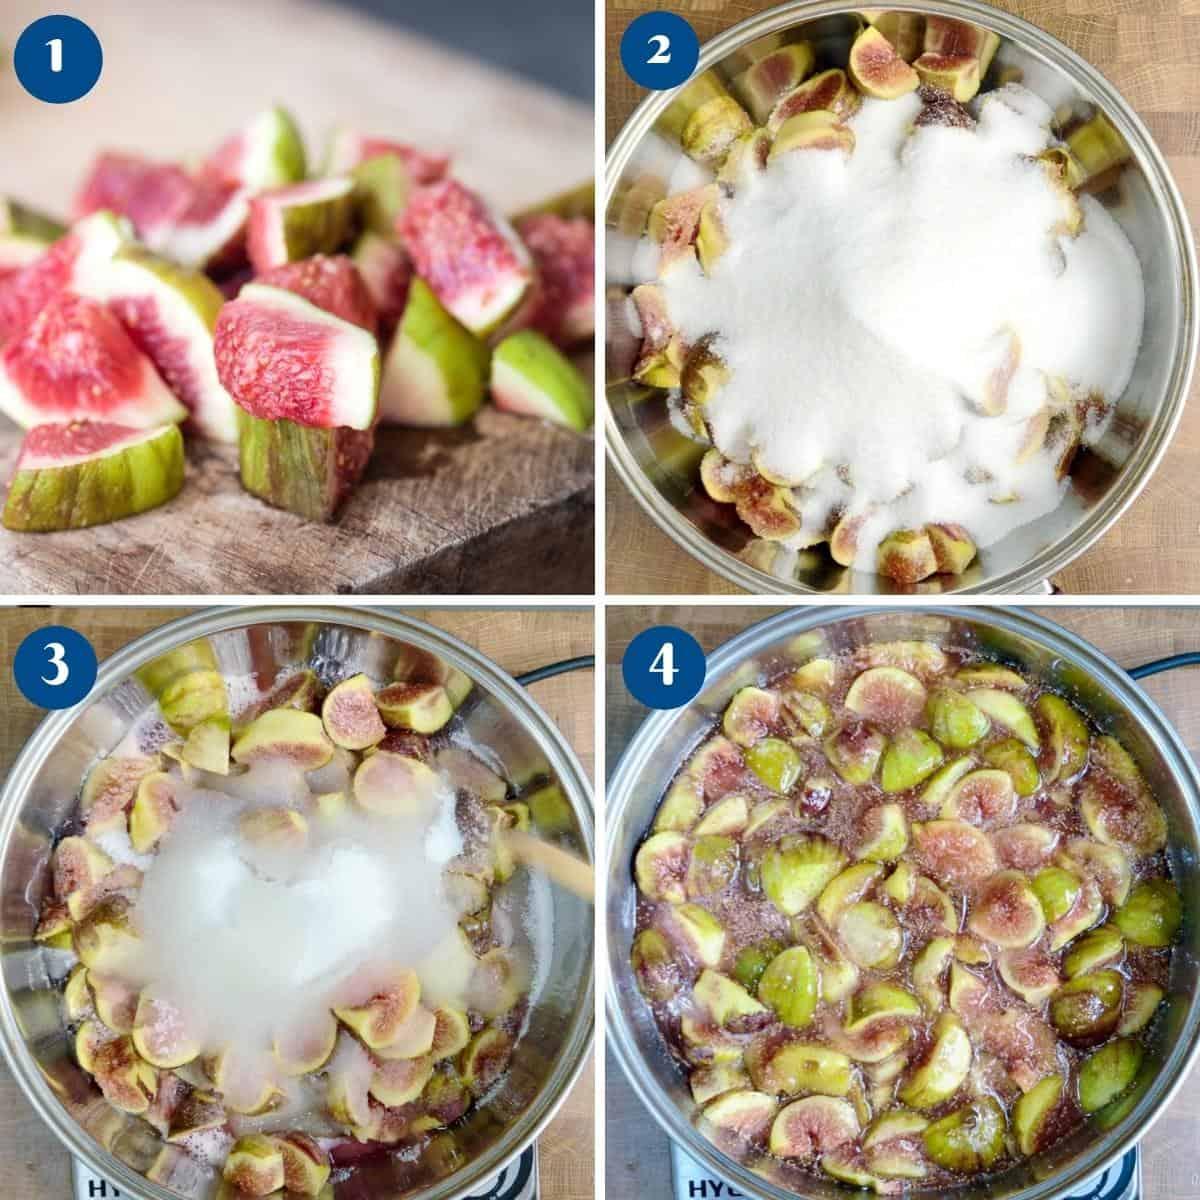 Progress pictures for fig jam recipe.